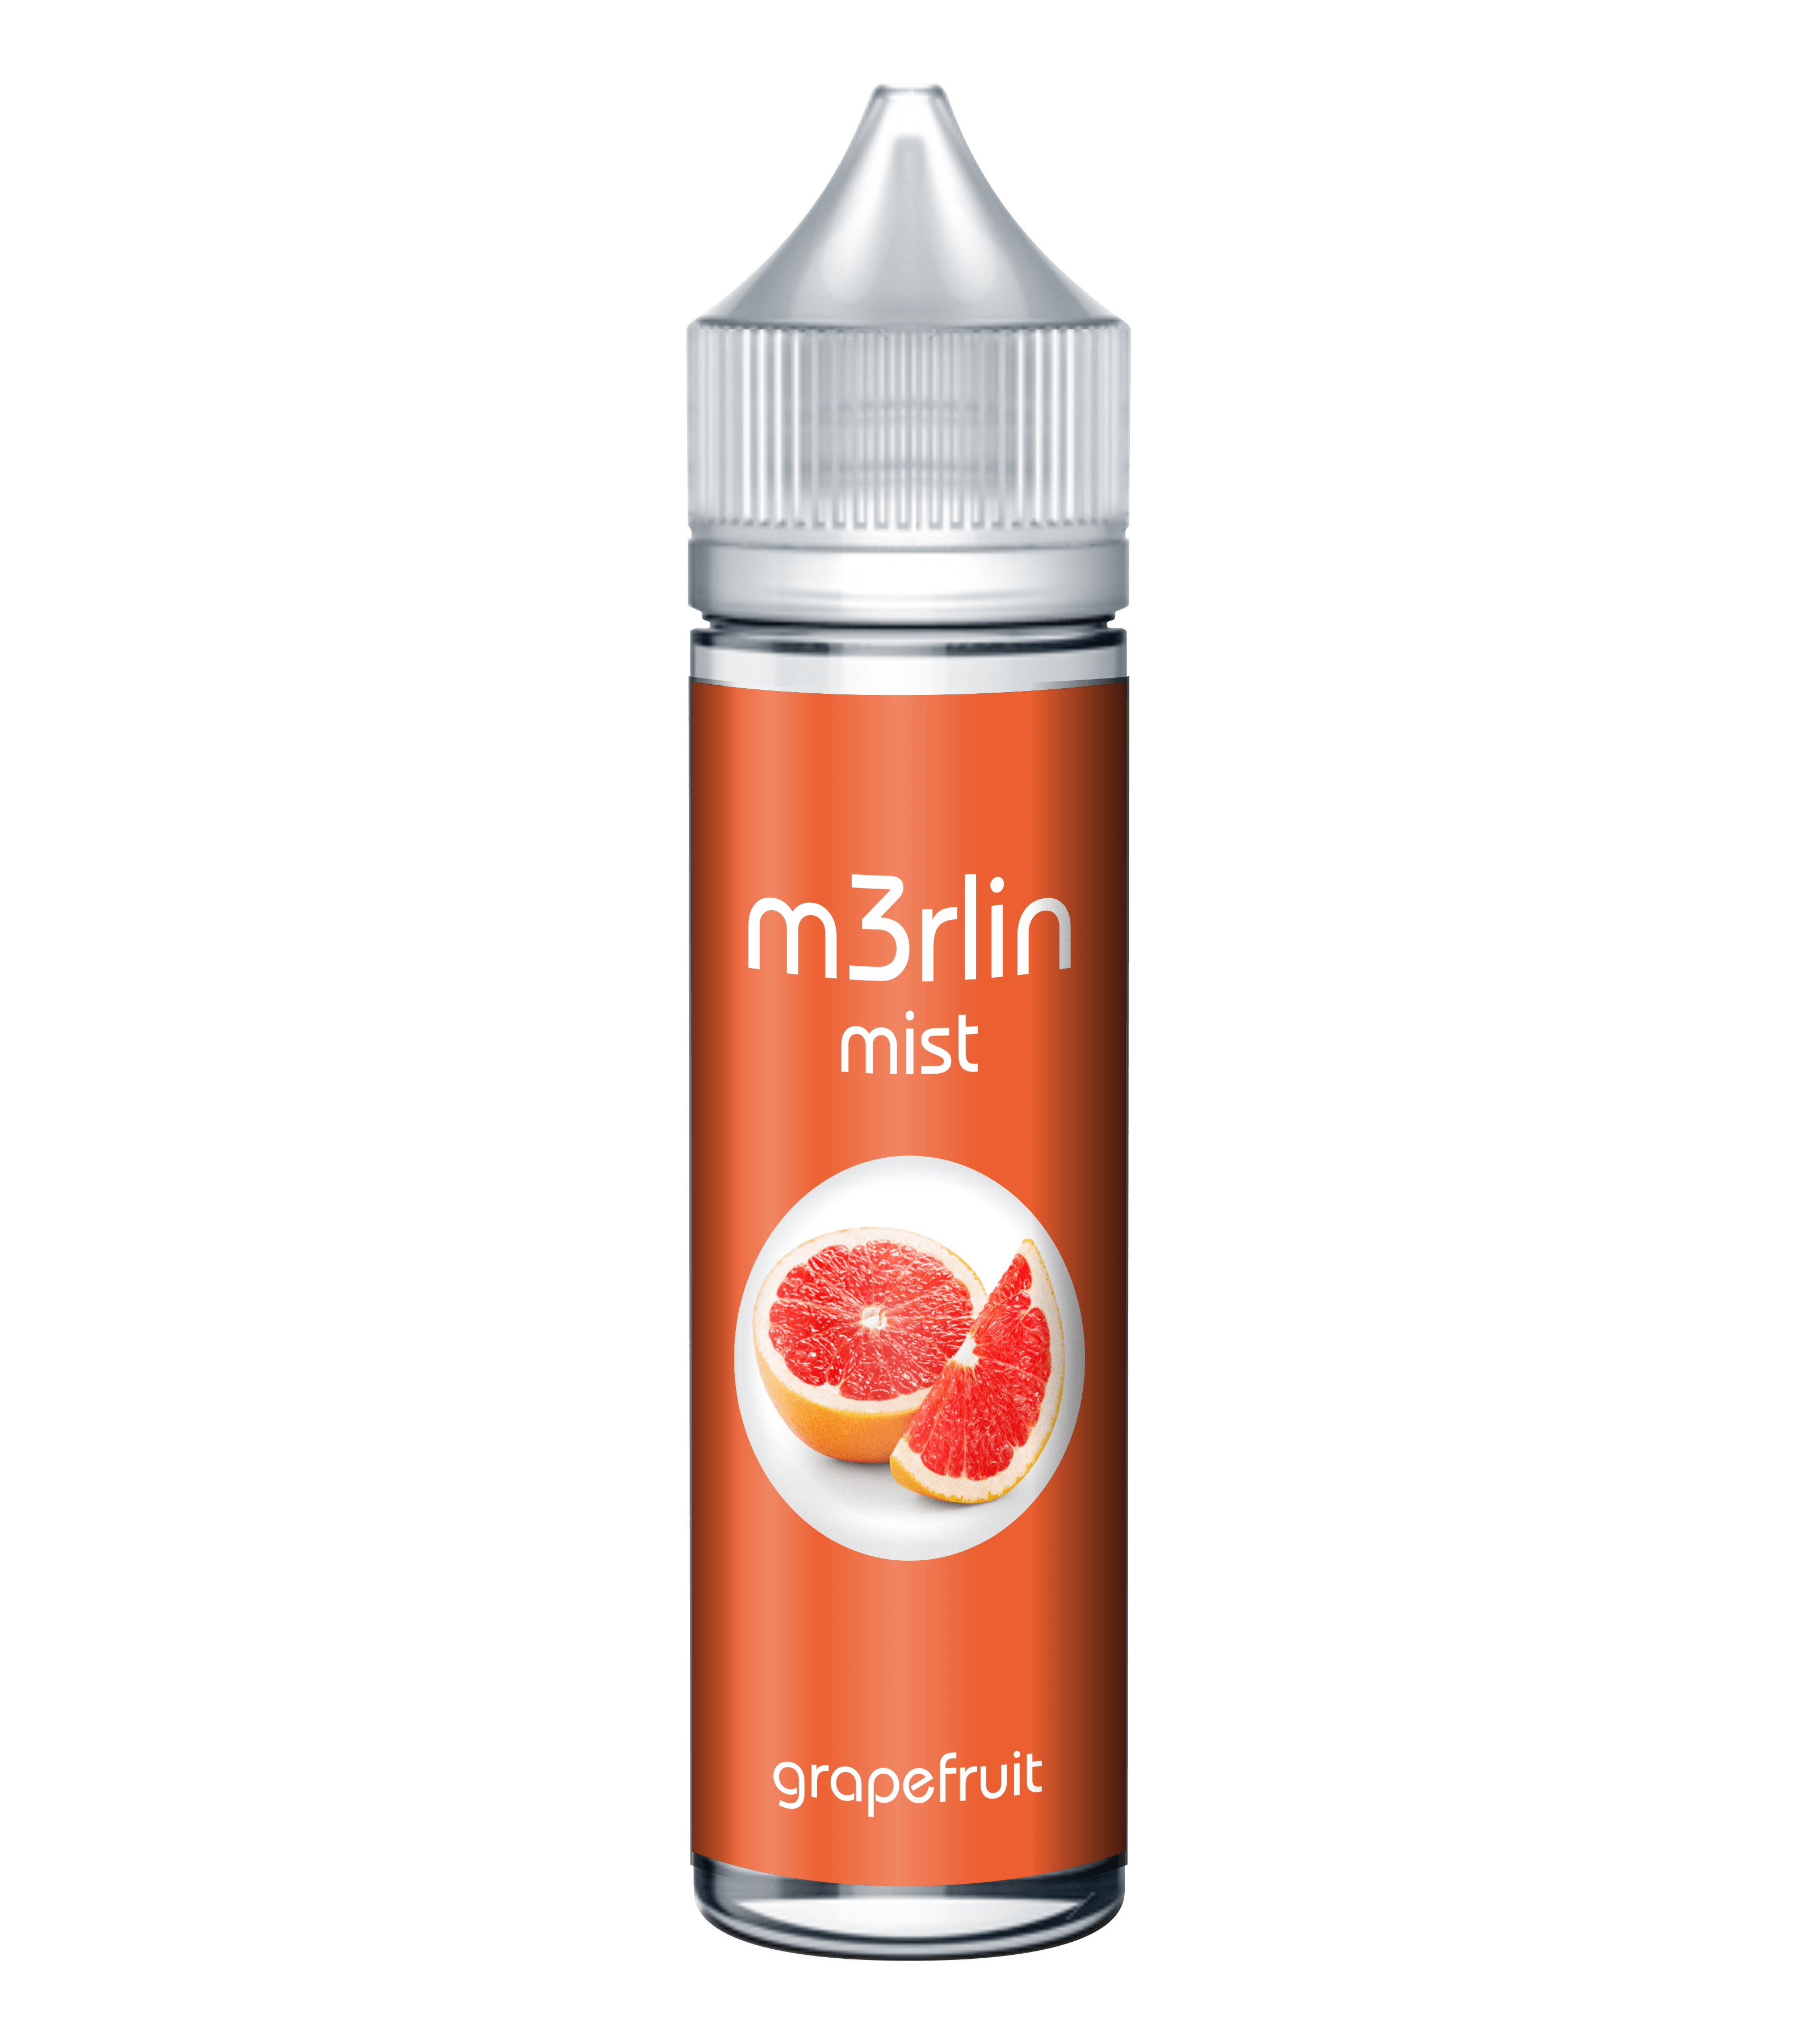 Lichid Tigara Electronica M3rlin Mist Grapefruit